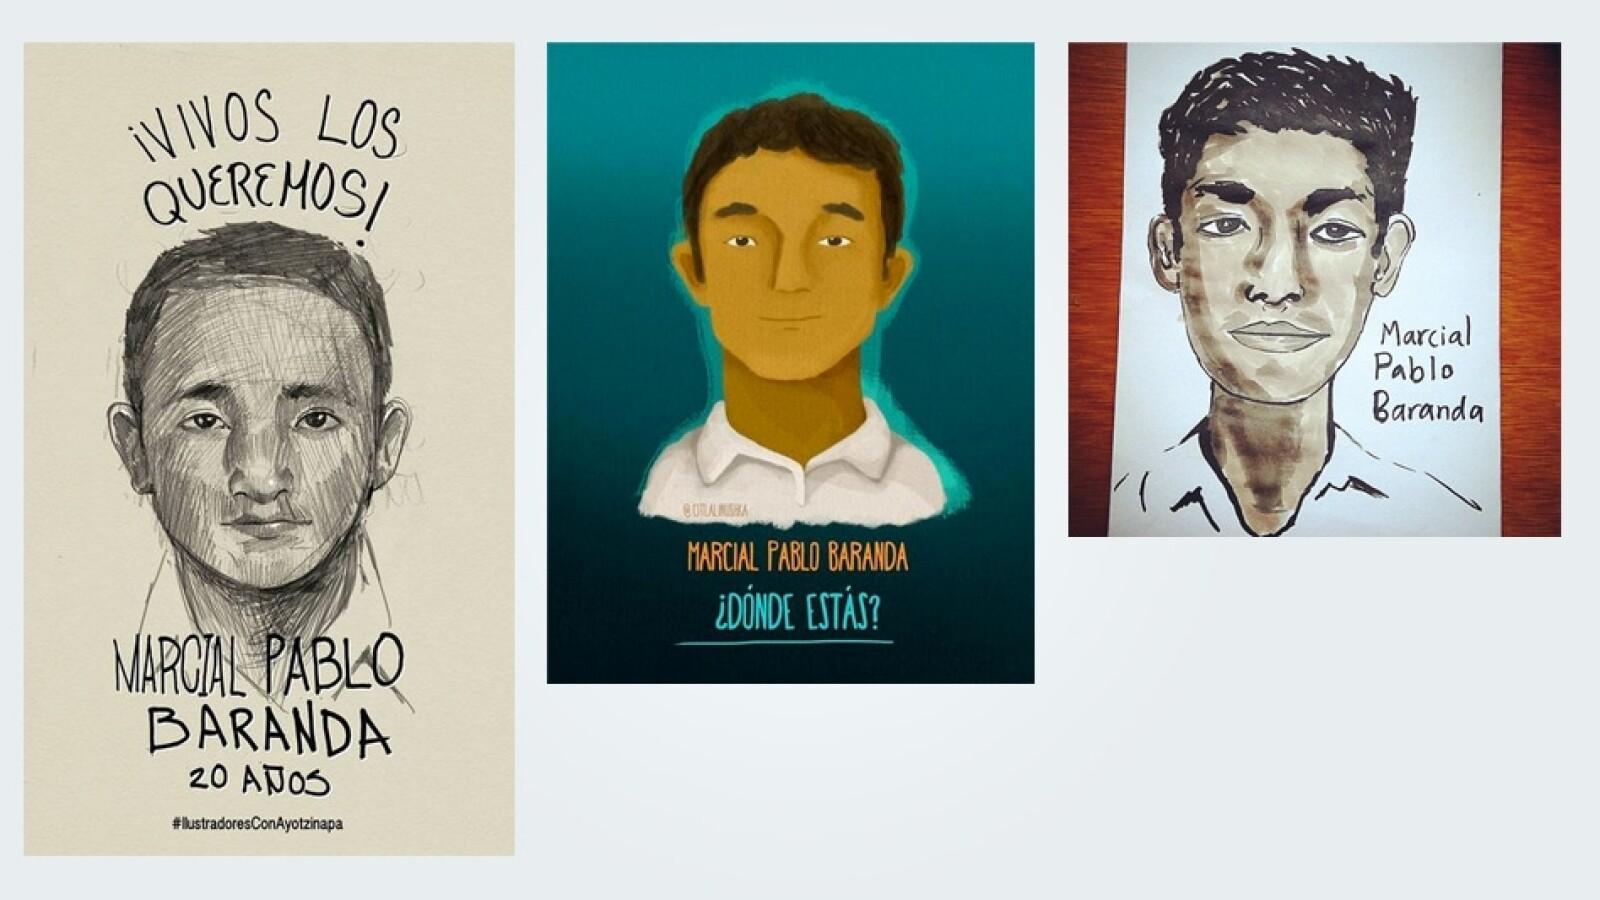 Marcial Pablo Baranda Ayotzinapa